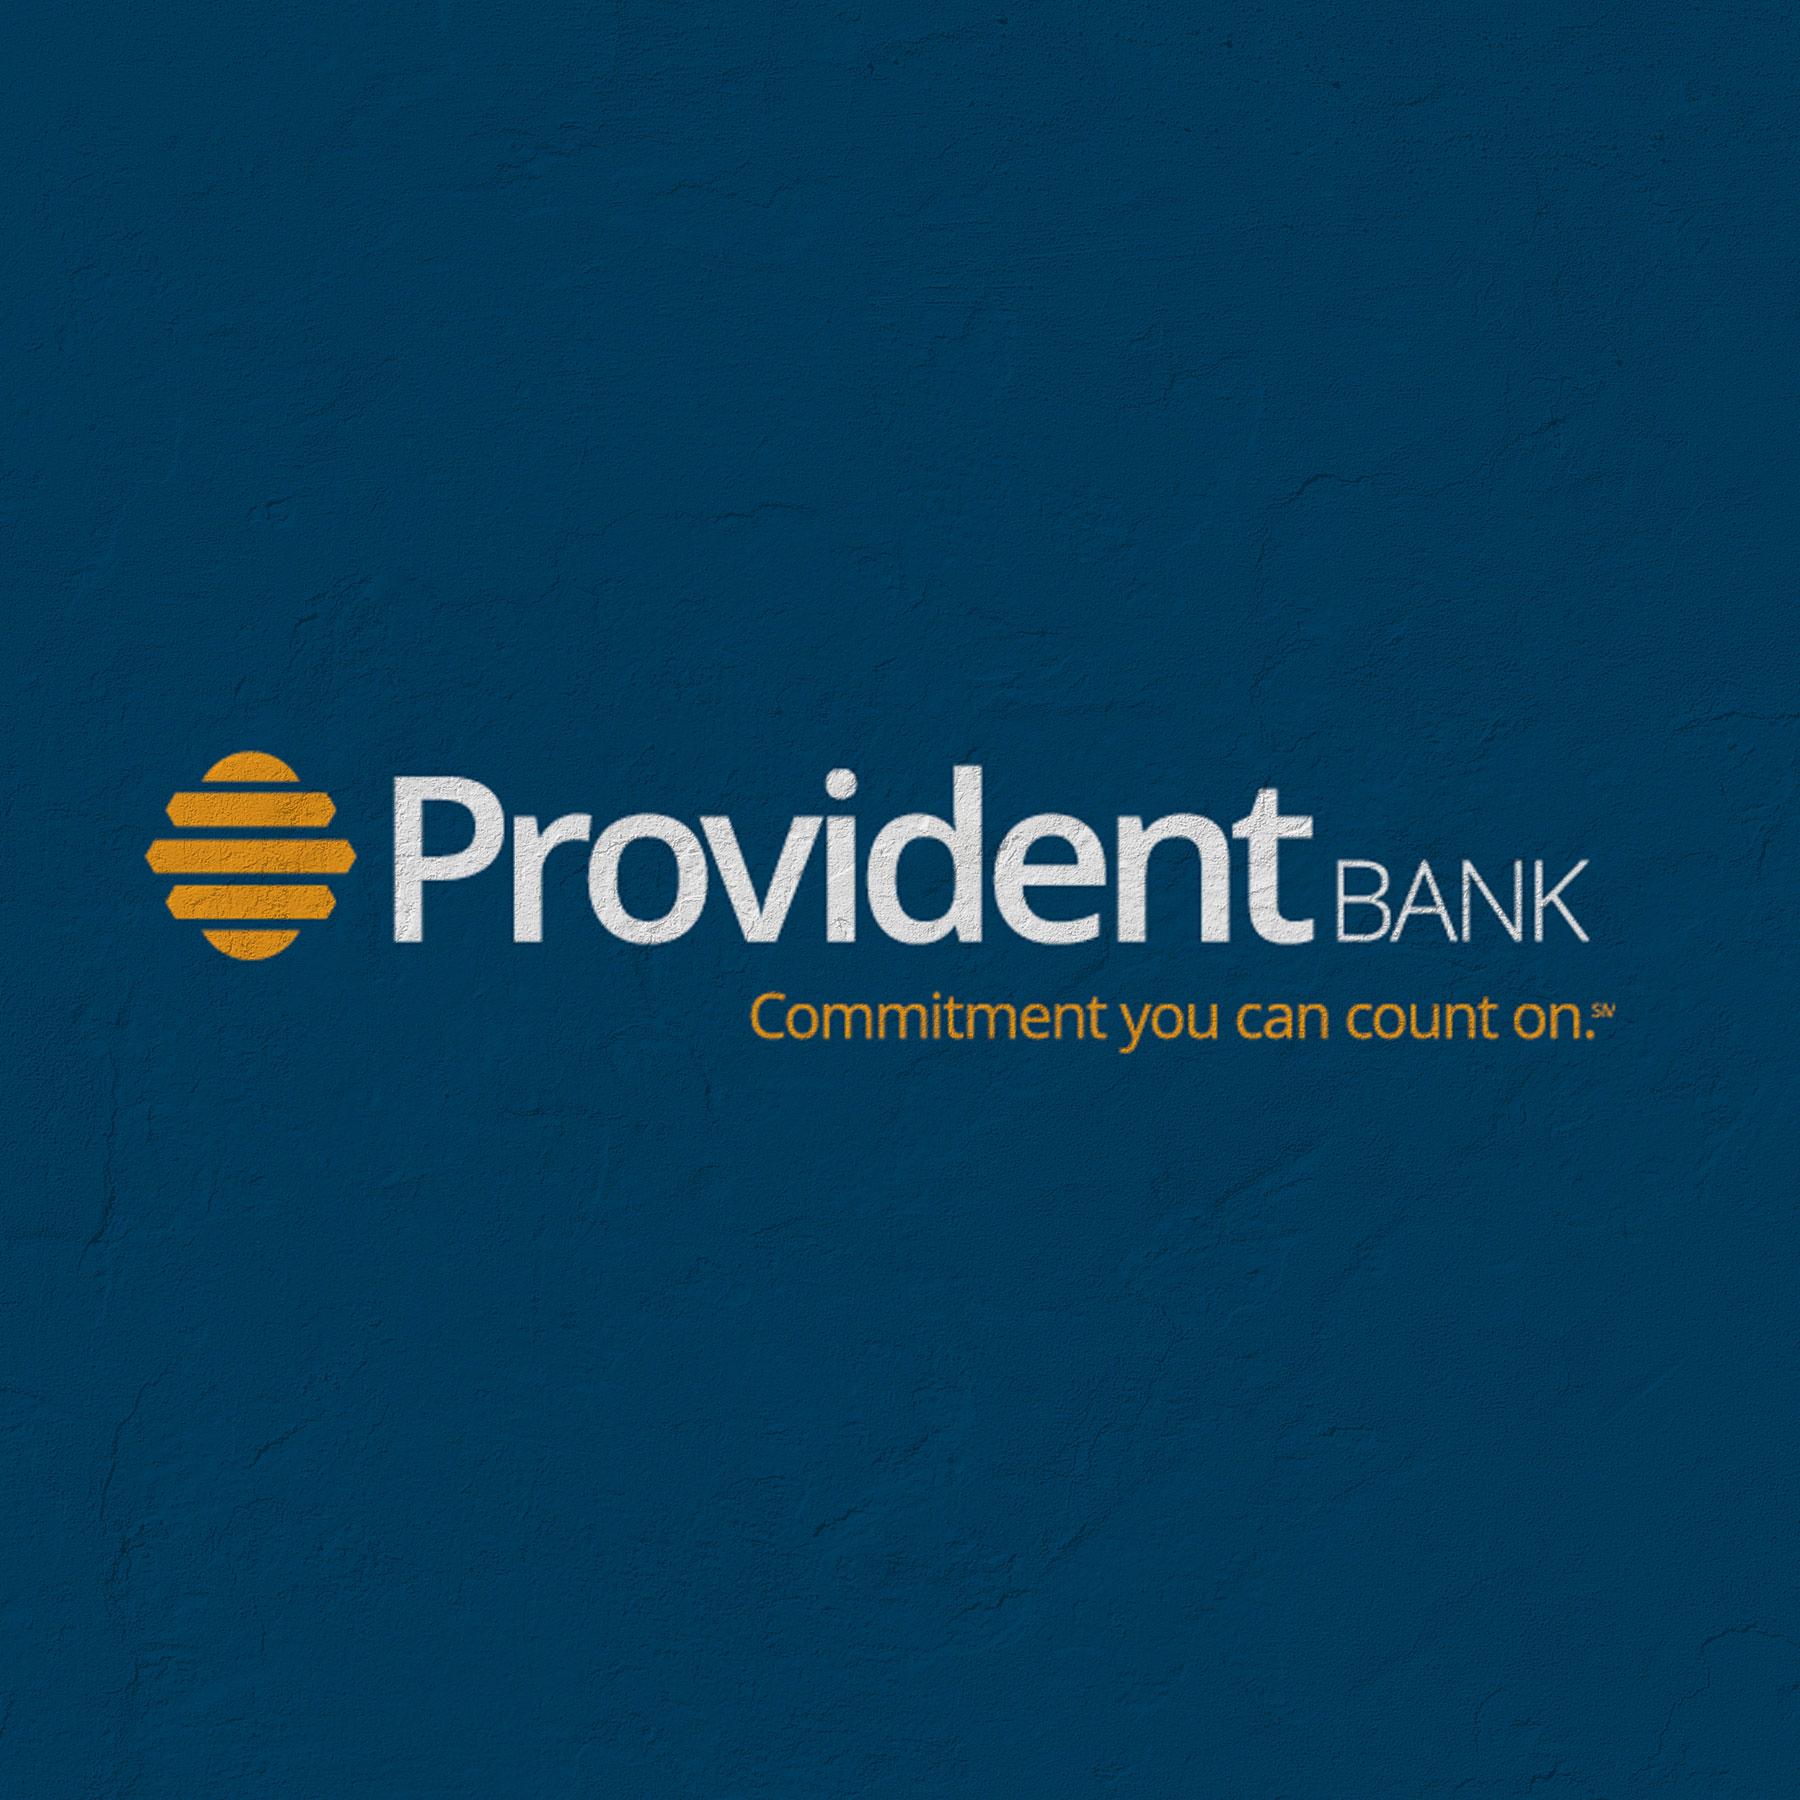 Banking-client.jpg